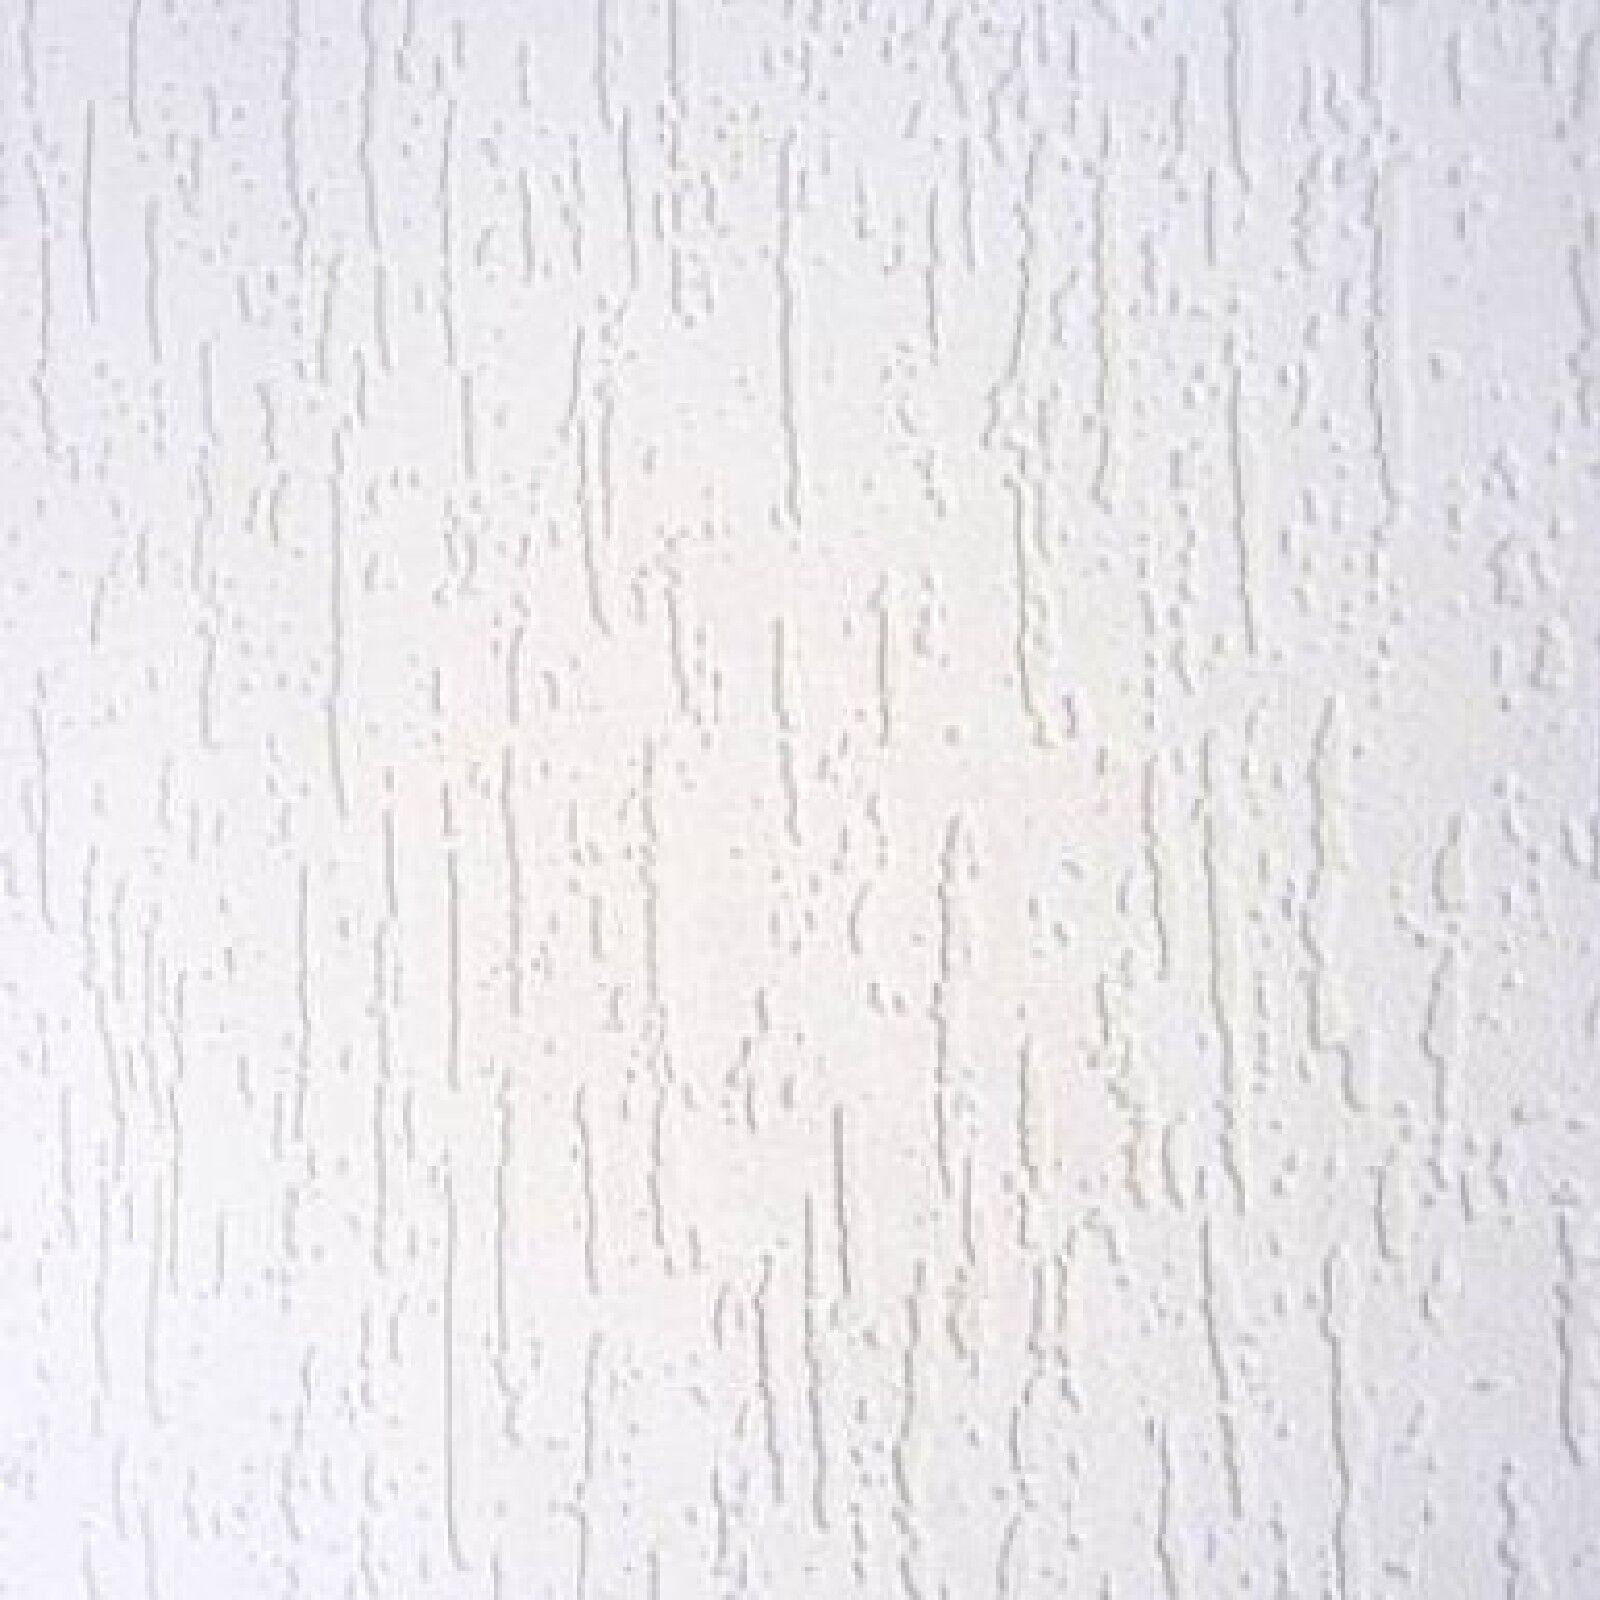 anaglypta wei geblasen vinyl gepr gt muster druckbar muster tapete 697110 ebay. Black Bedroom Furniture Sets. Home Design Ideas